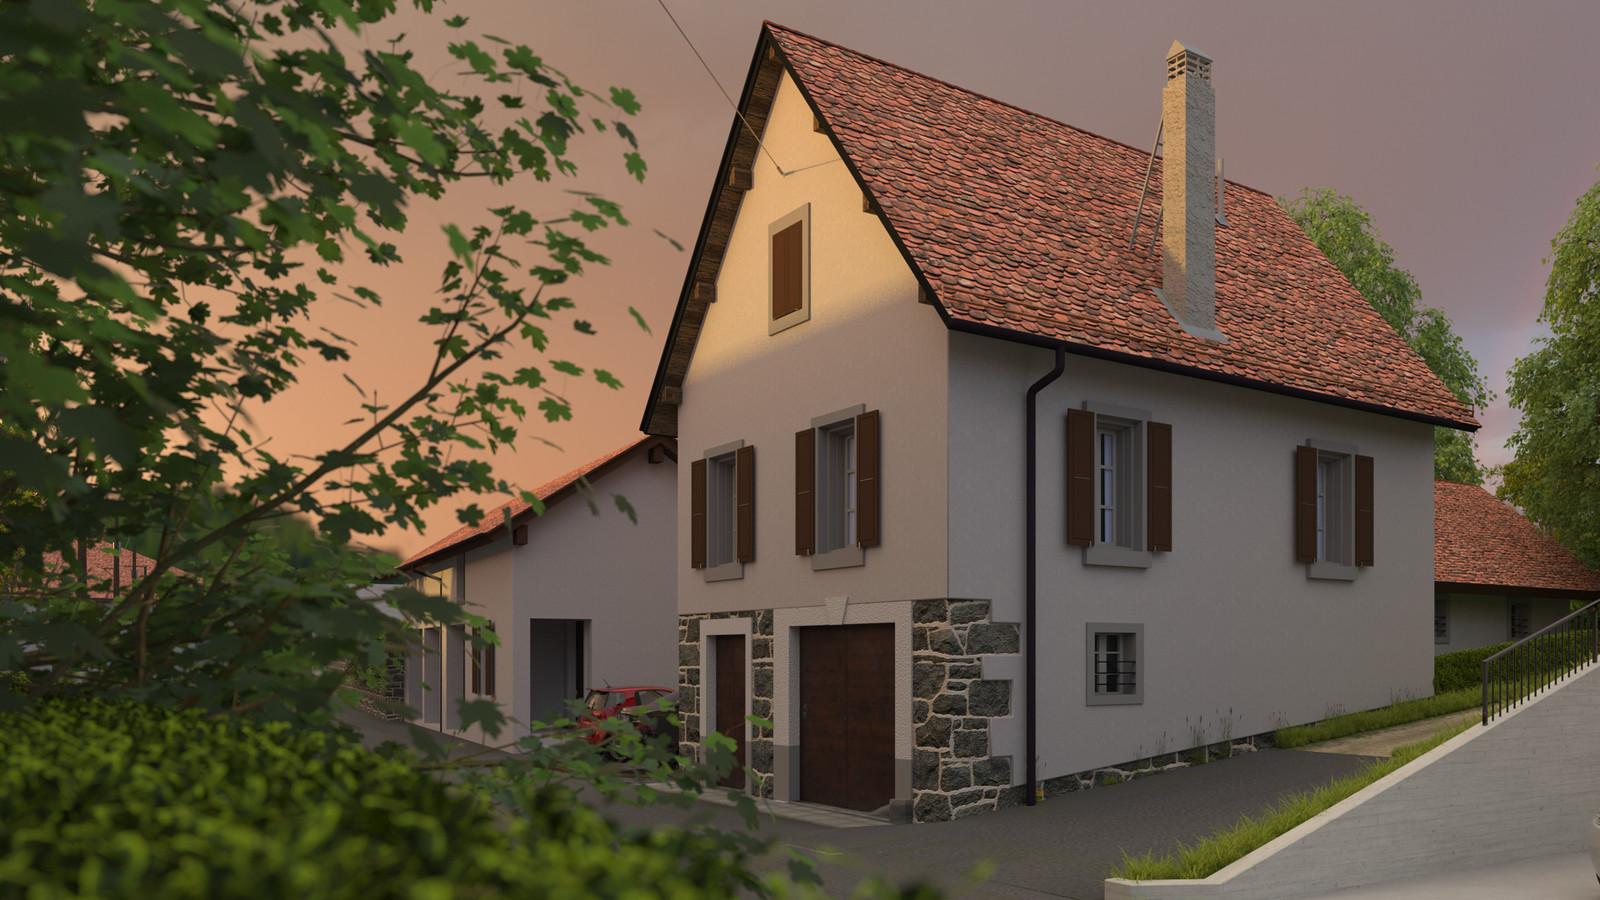 SketchUp + Thea Render  Little Swiss House Scene 28 250-hdri-skies 01b HD 1920 x 1080 Presto MC  HDR by HDRI-SKIES found here: http://hdri-skies.com/shop/hdri-sky-250/